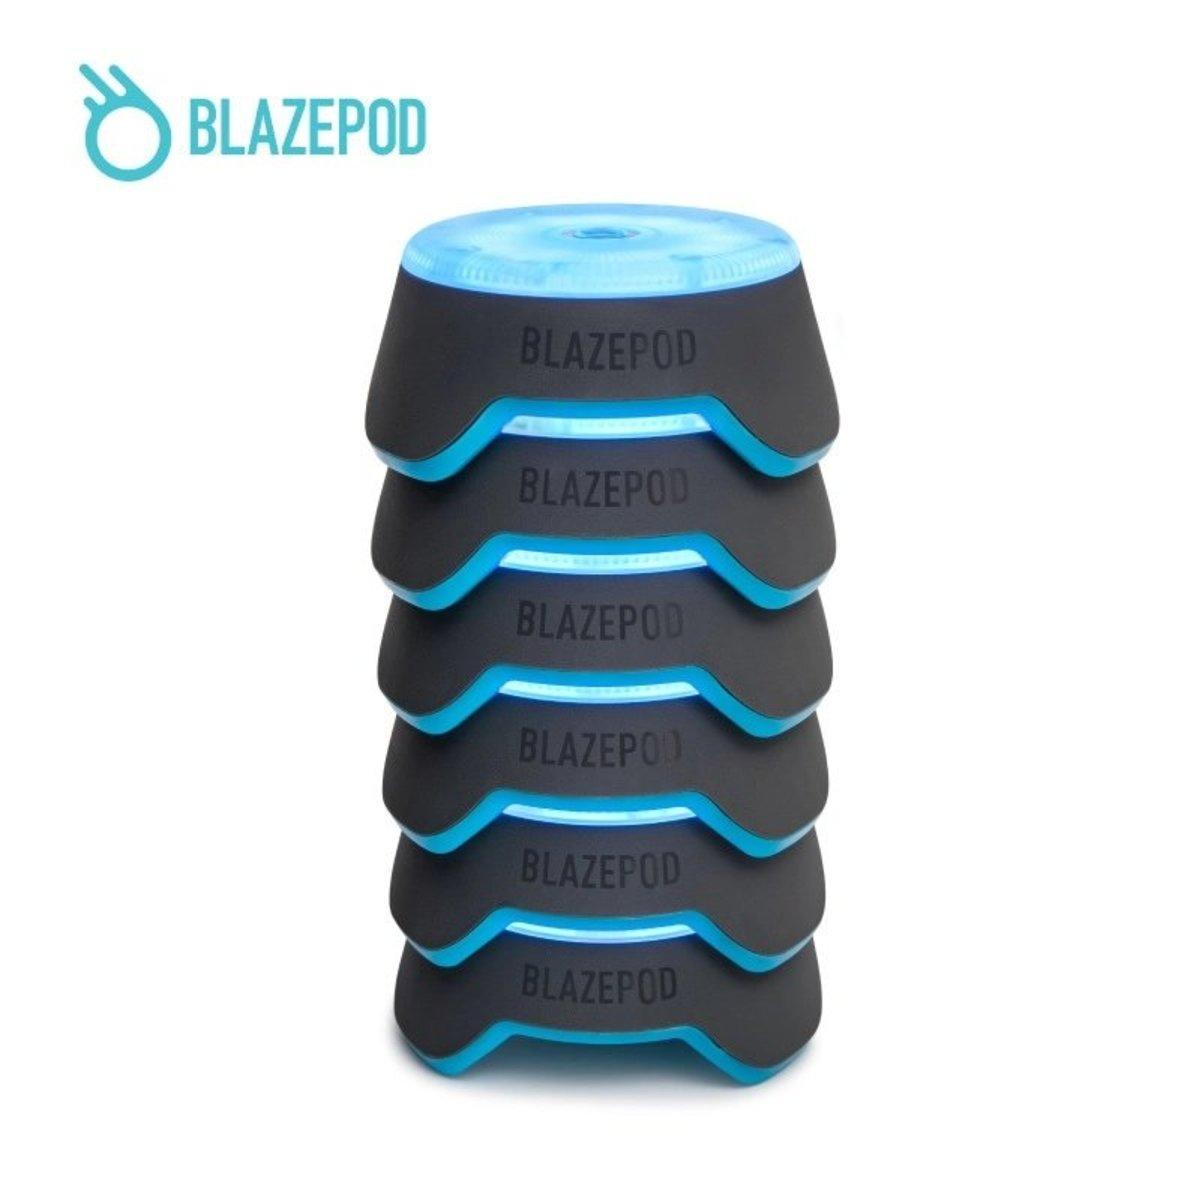 BlazePod 反應燈訓練組合 (6燈)